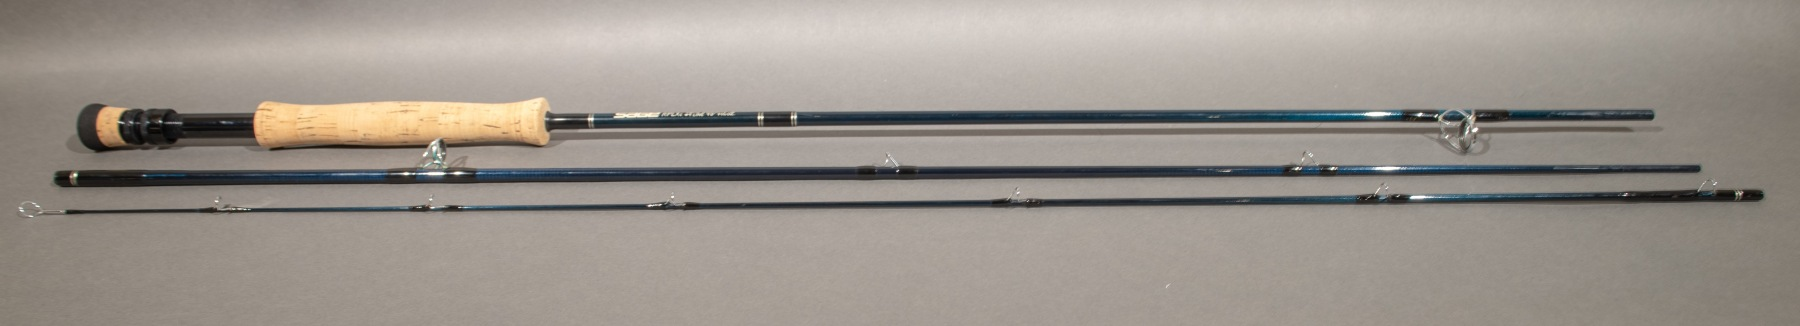 SAGE-RPLXLi-990-3-126.jpg